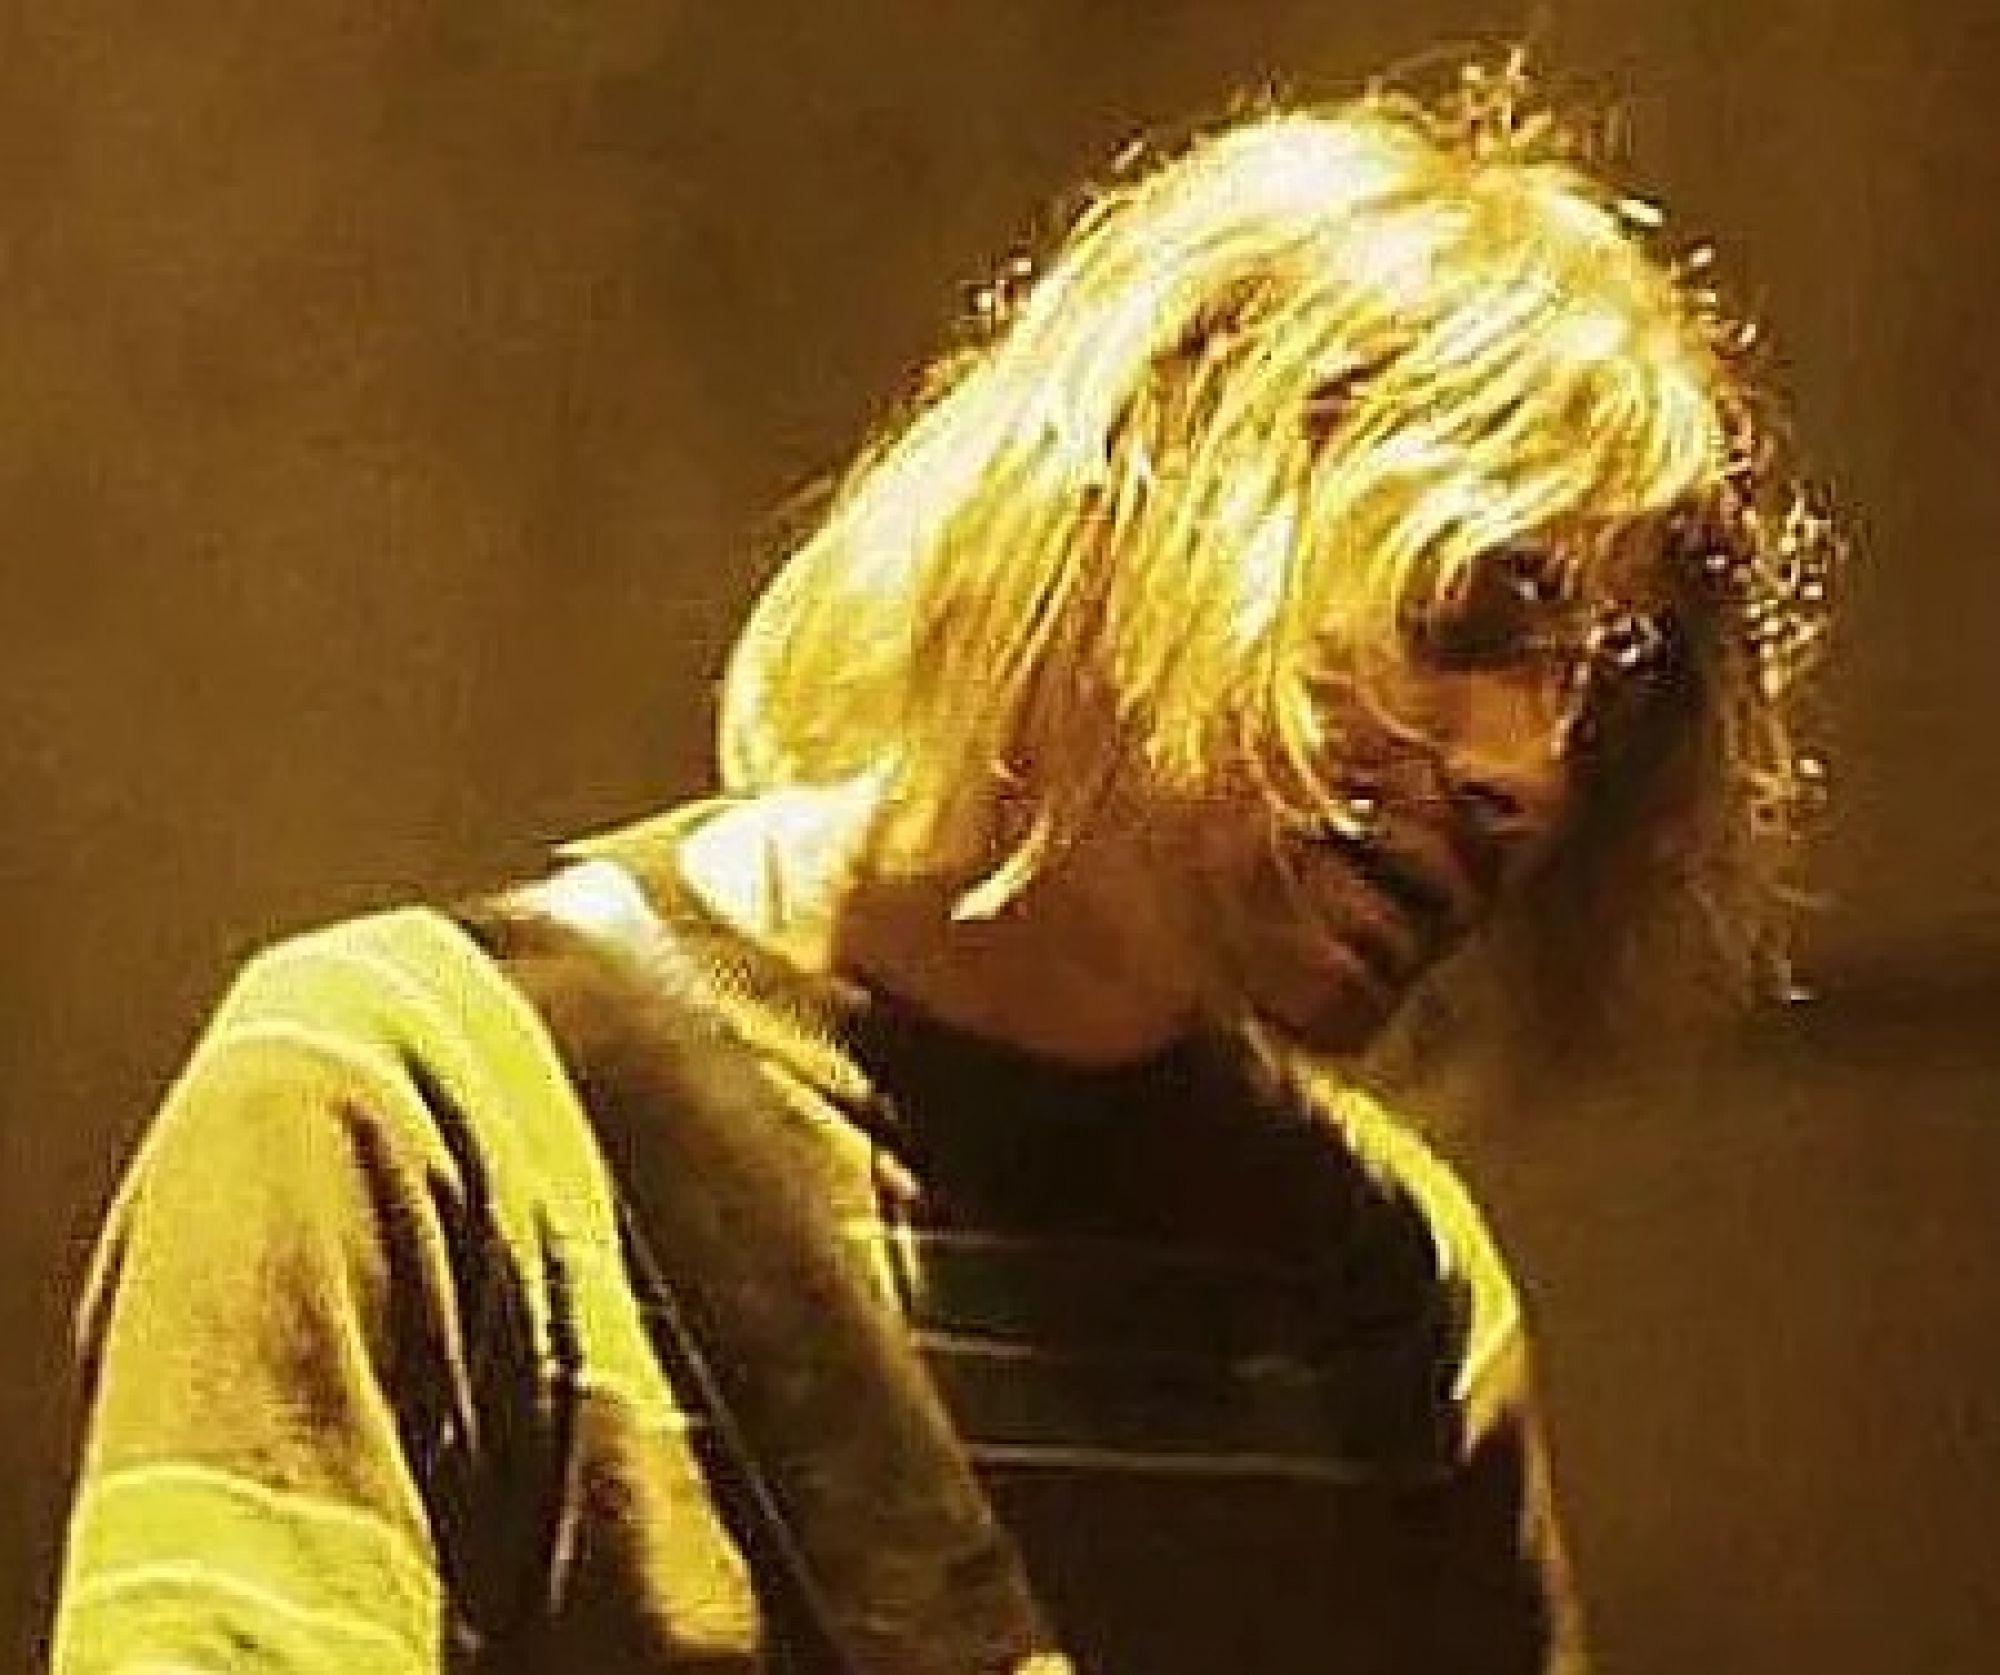 Легендарный хит группы Nirvana стал миллиардером на YouTube